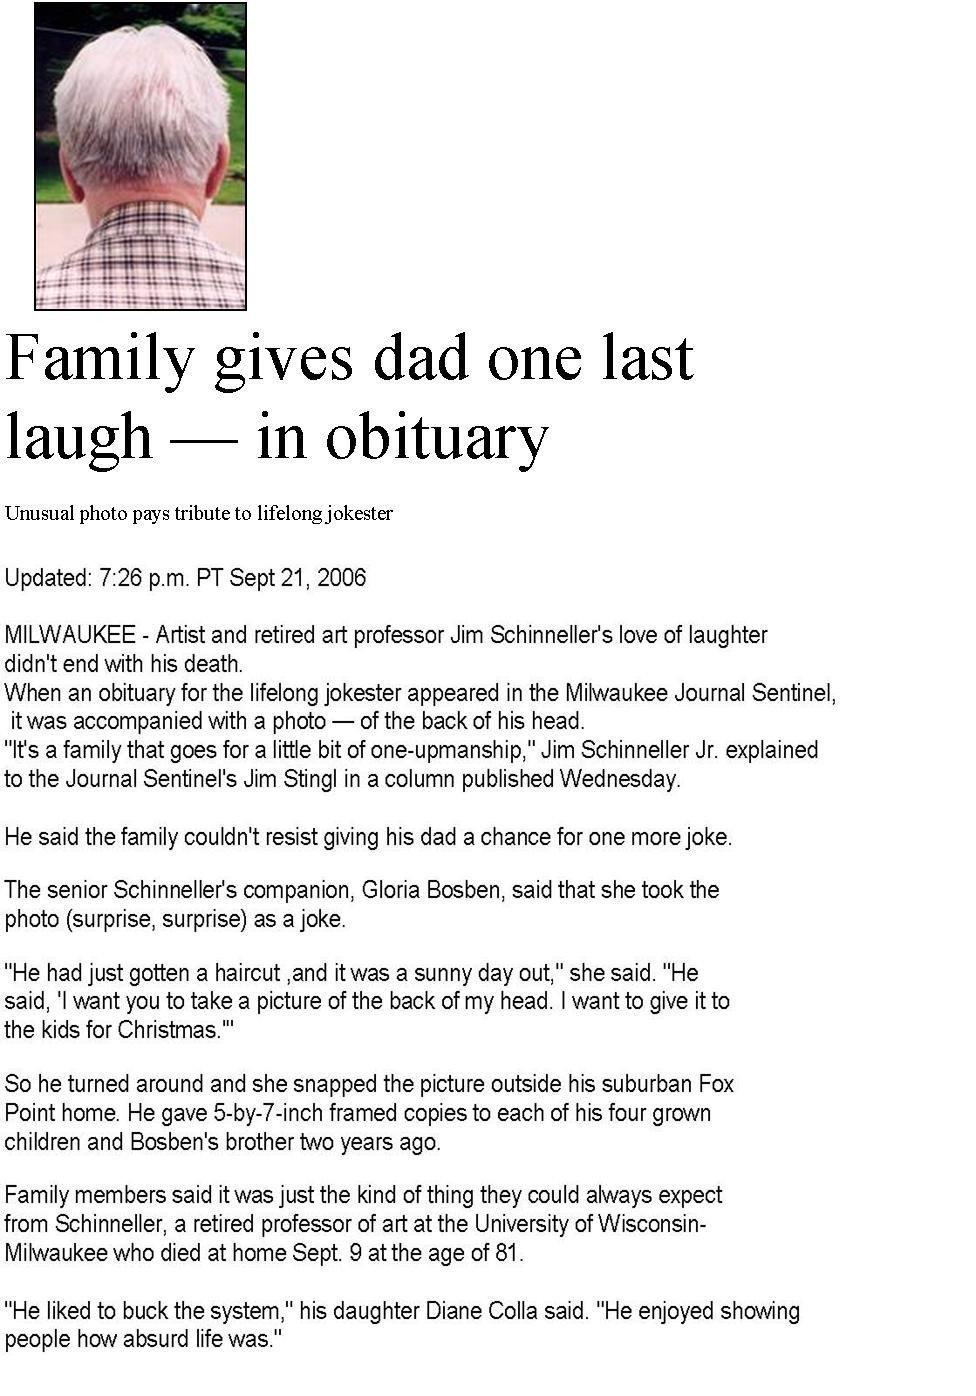 Writing An Obituary Template Obituary Examples Sample Obituary Make It Unique with